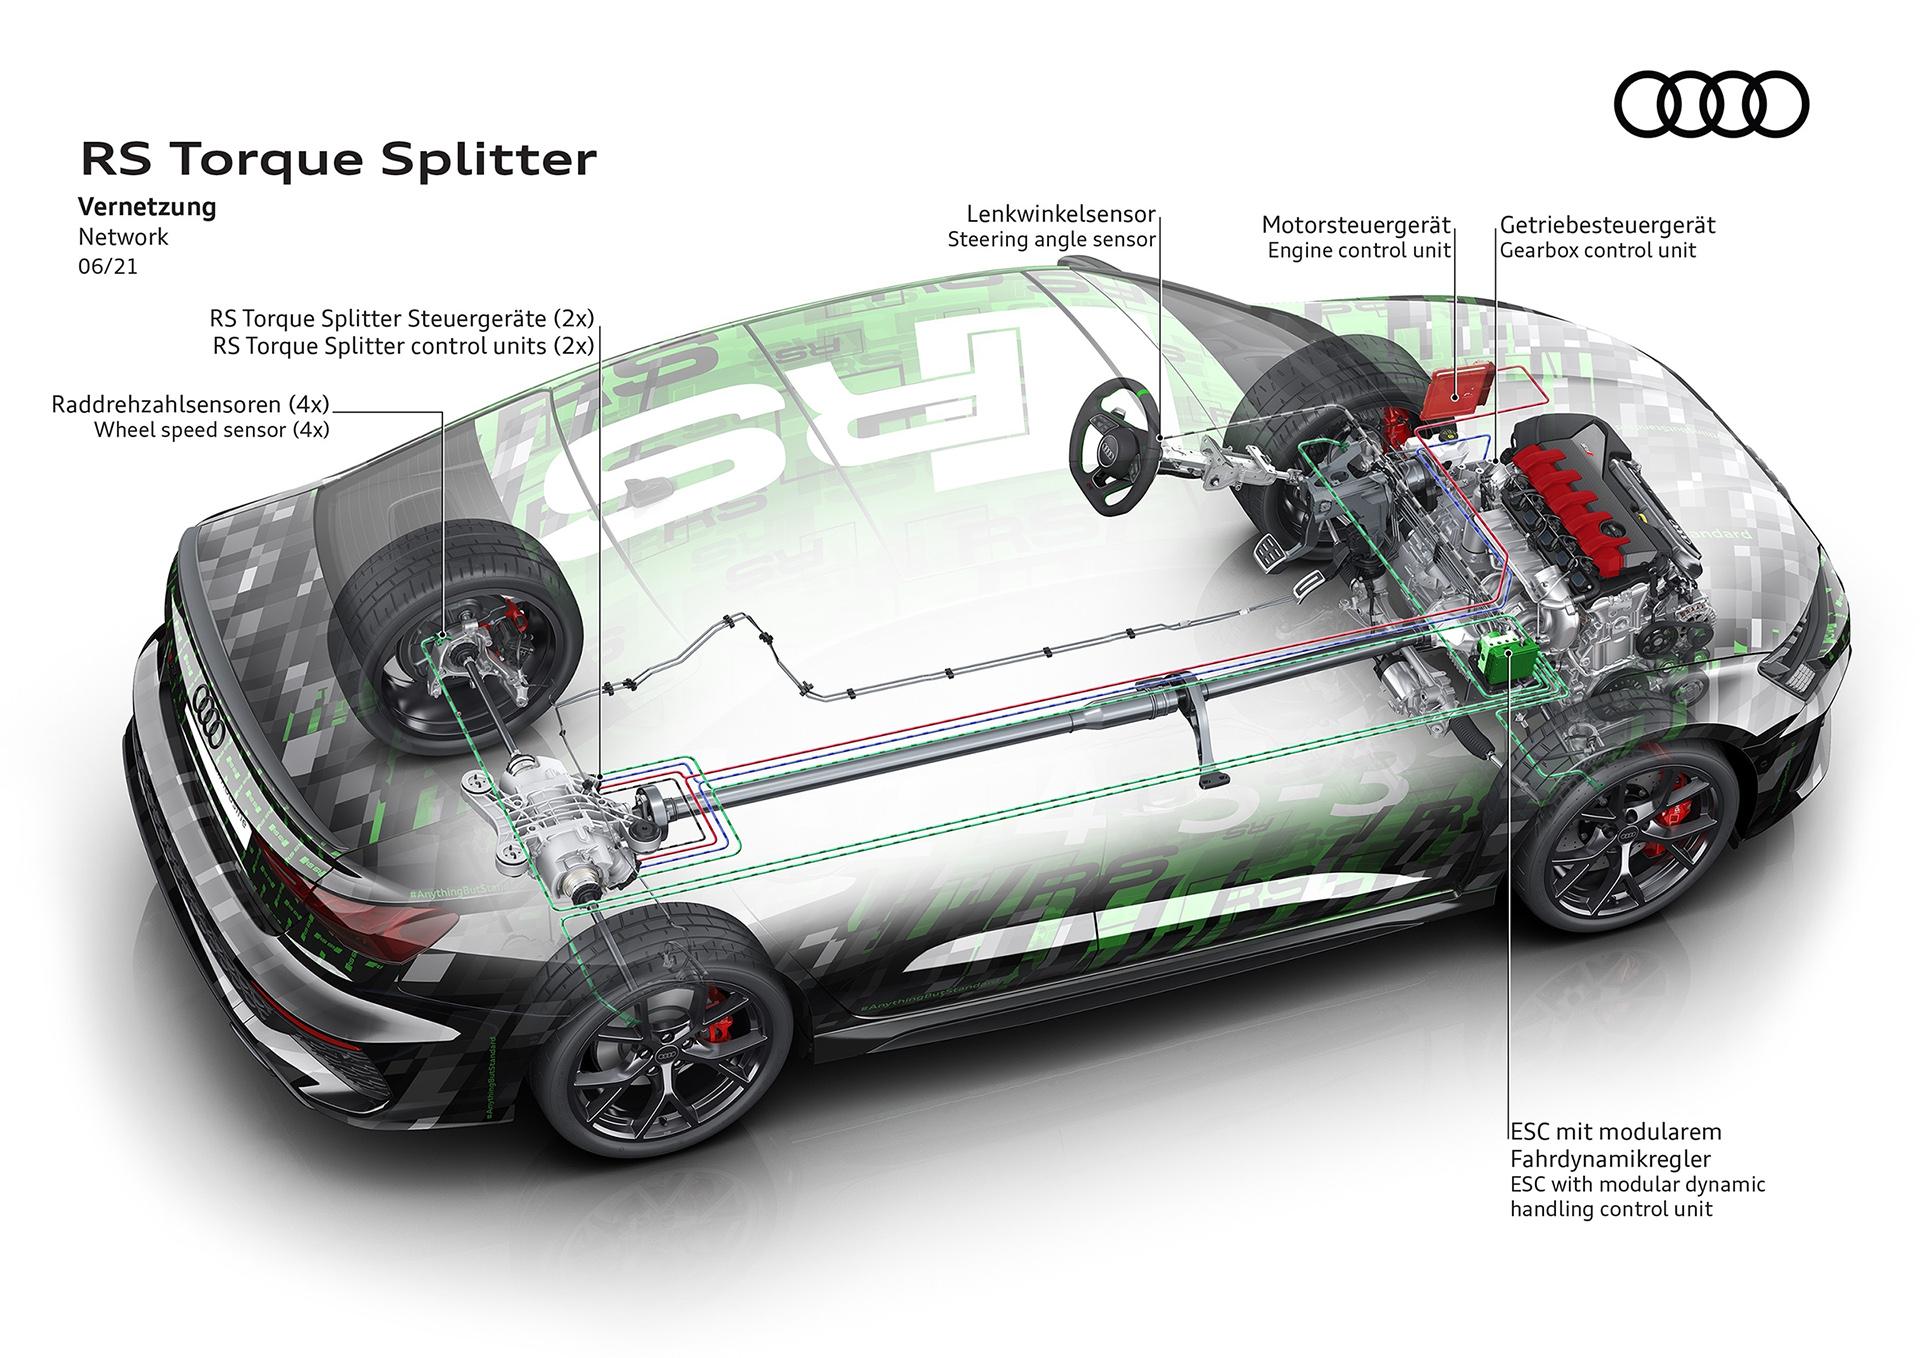 NEO AUDI RS 3 TORQUE SPLITTER 13 Πώς λειτουργεί το RS Torque Splitter του νέου Audi RS 3 Audi, Audi RS, Audi RS3, RS3, zblog, ειδήσεις, Νέα, τεχνικά